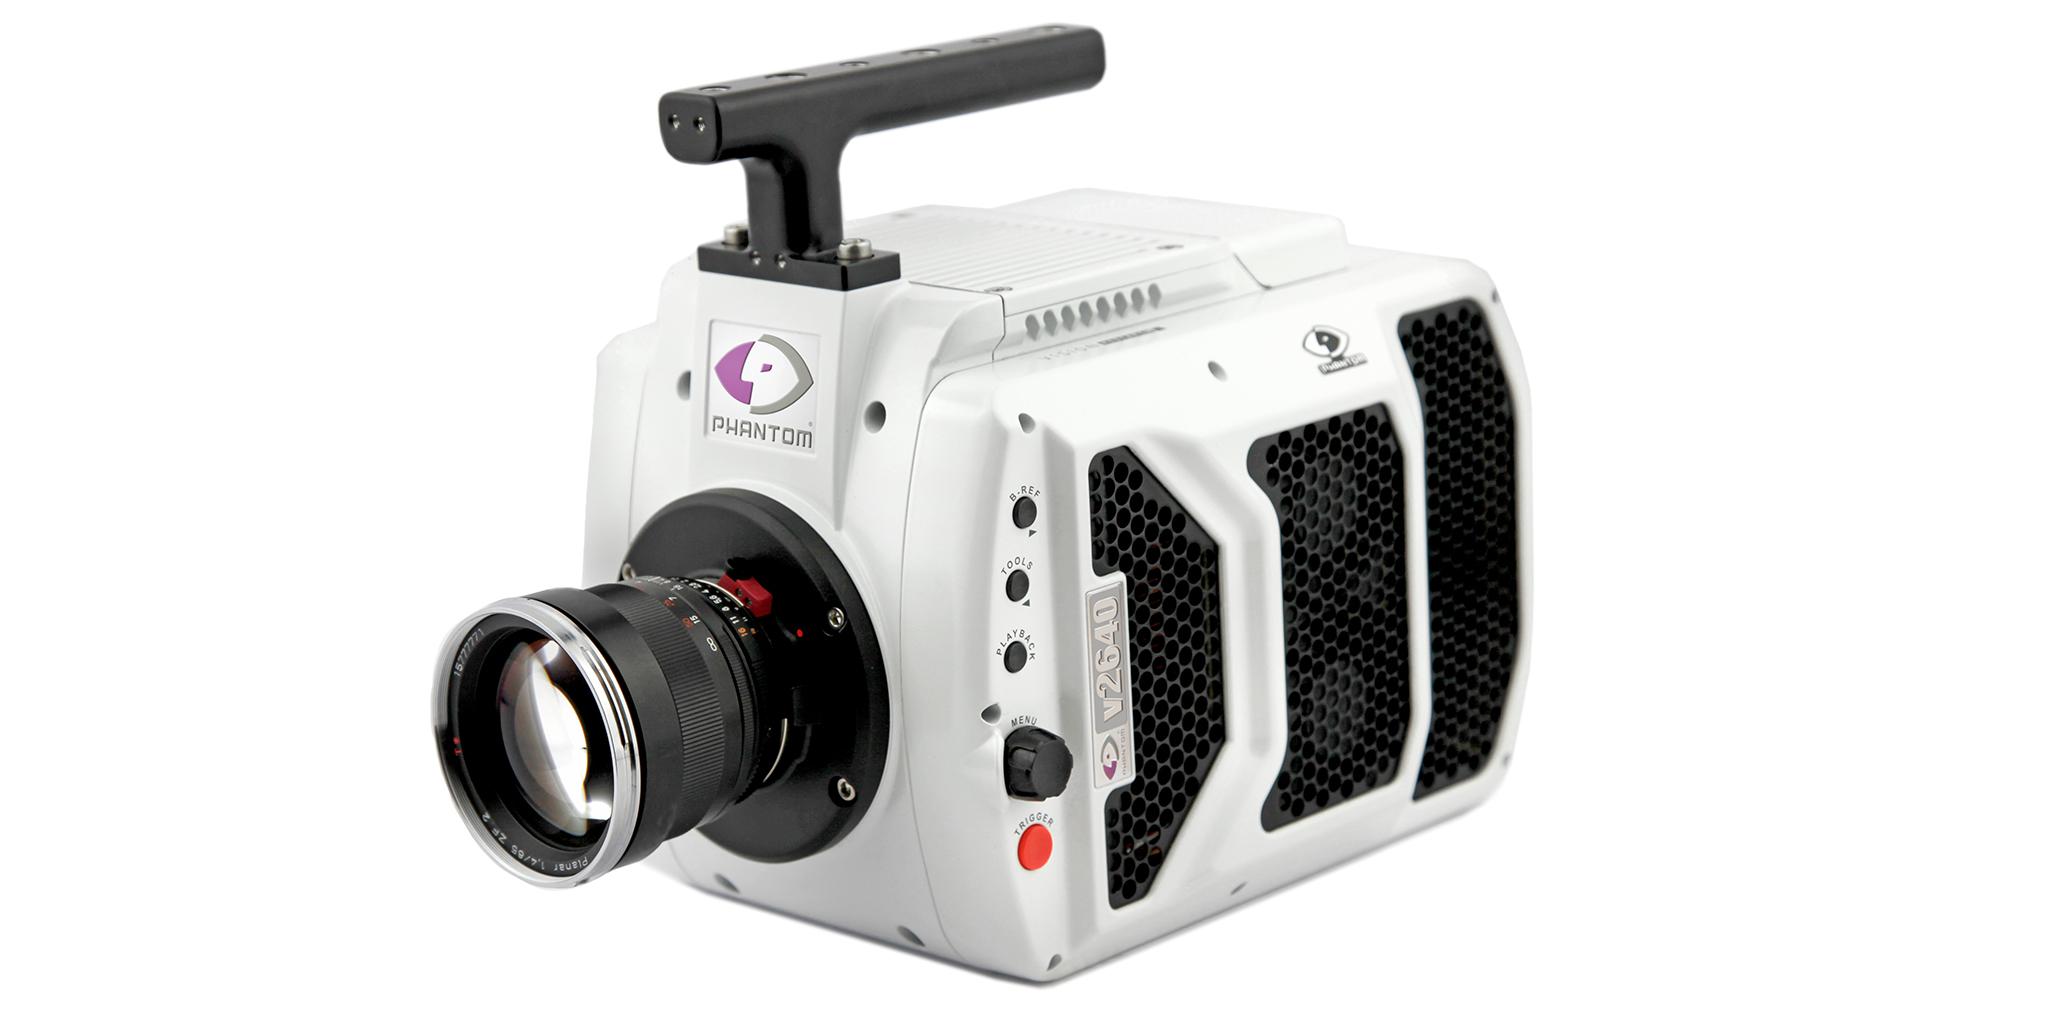 Phantom v2640 - Camera.tinhte.vn 2.jpg